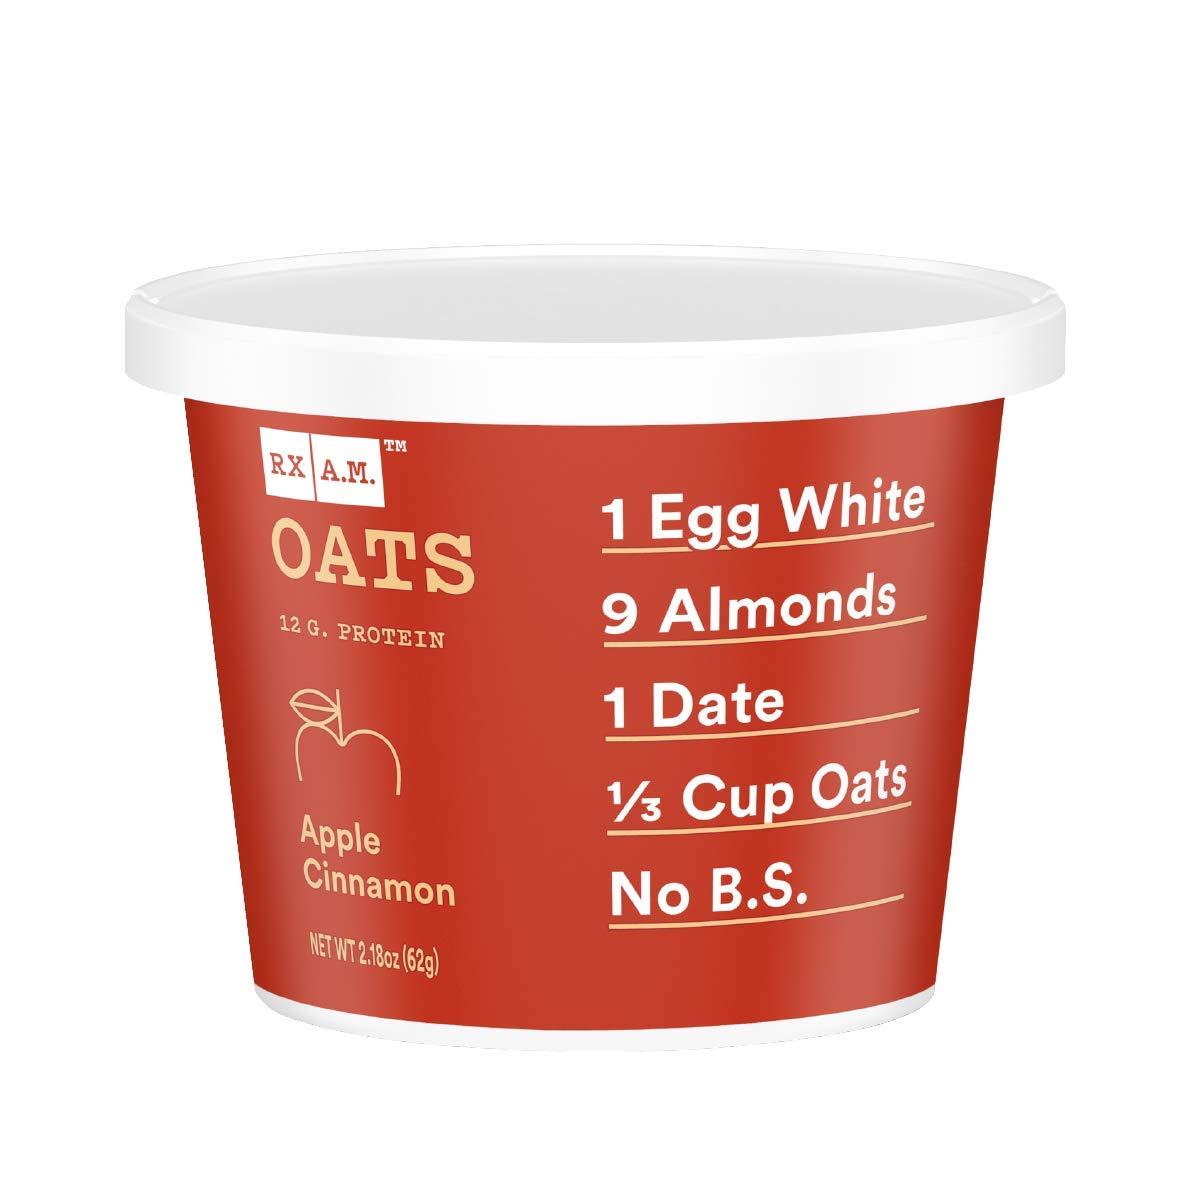 RXBAR, Rx A.M. Oats, Apple Cinnamon, 12ct, 2.18oz Cups, 12 Gluten Free Oatmeal Cups